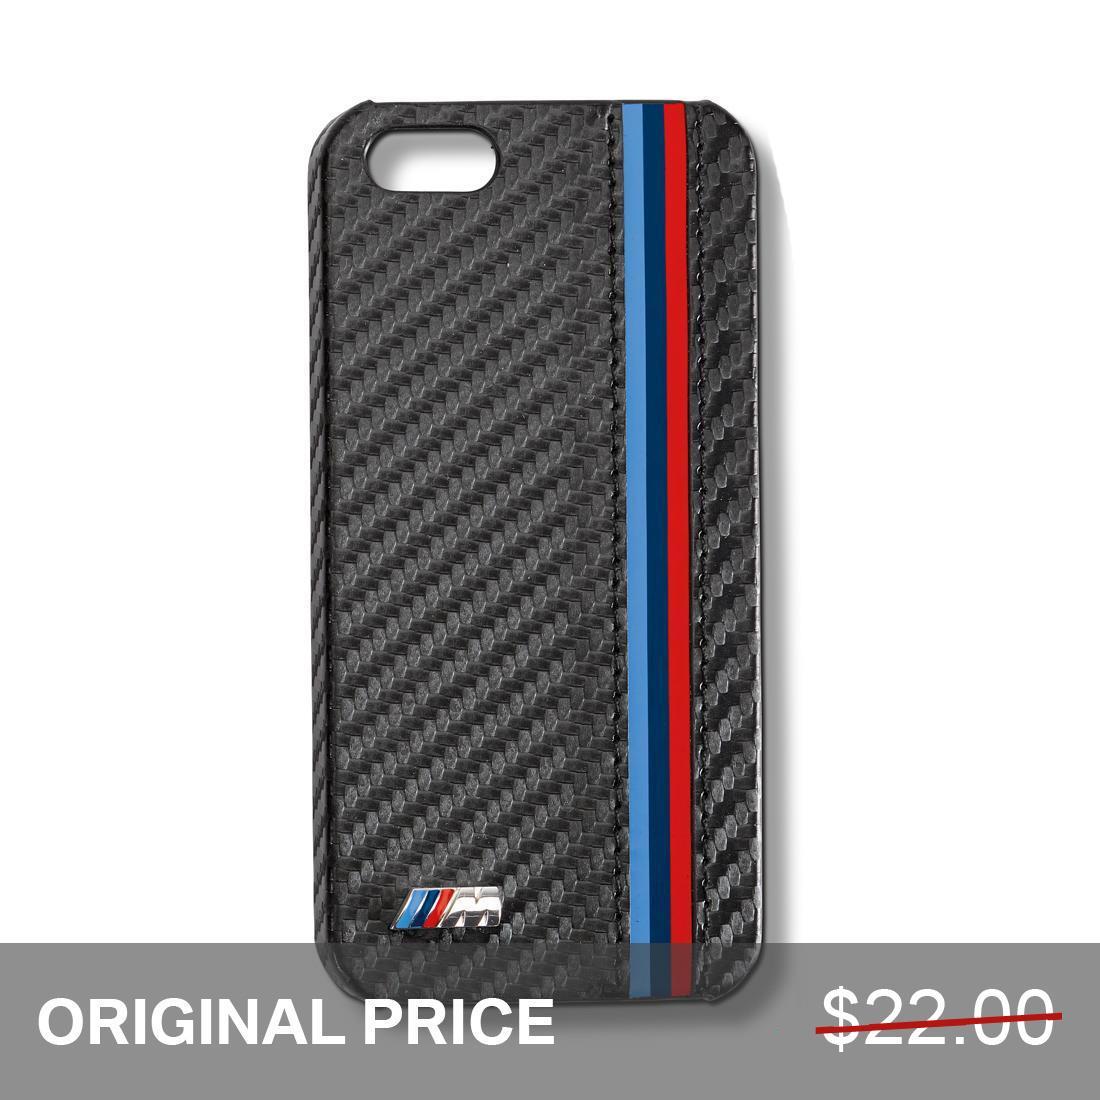 ShopBMWUSA.com: BMW M HARD COVER